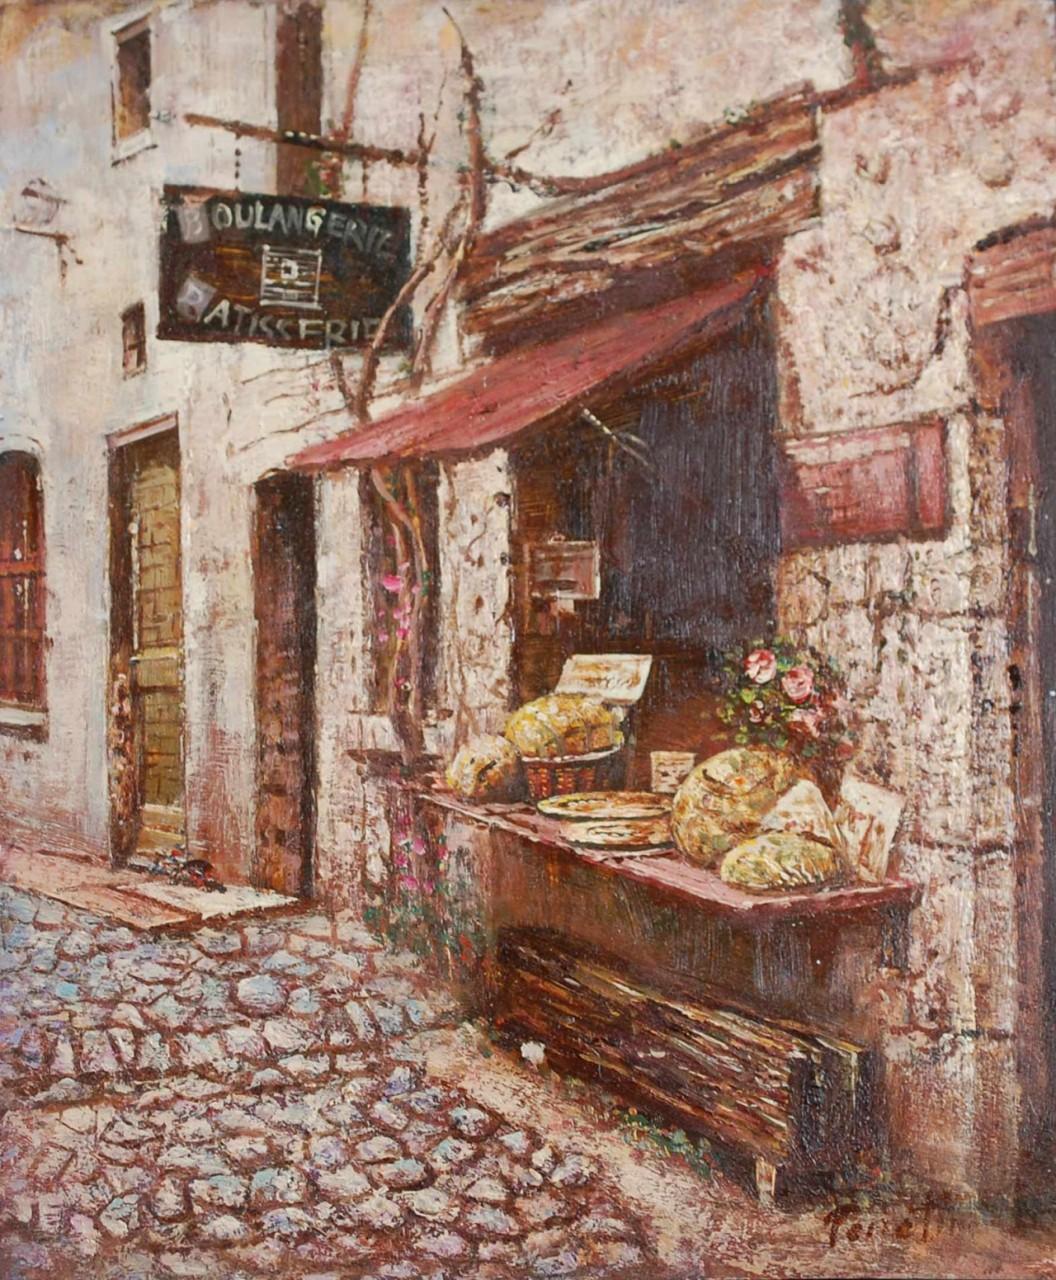 ECOLE MODERNE boulangerie petites rue